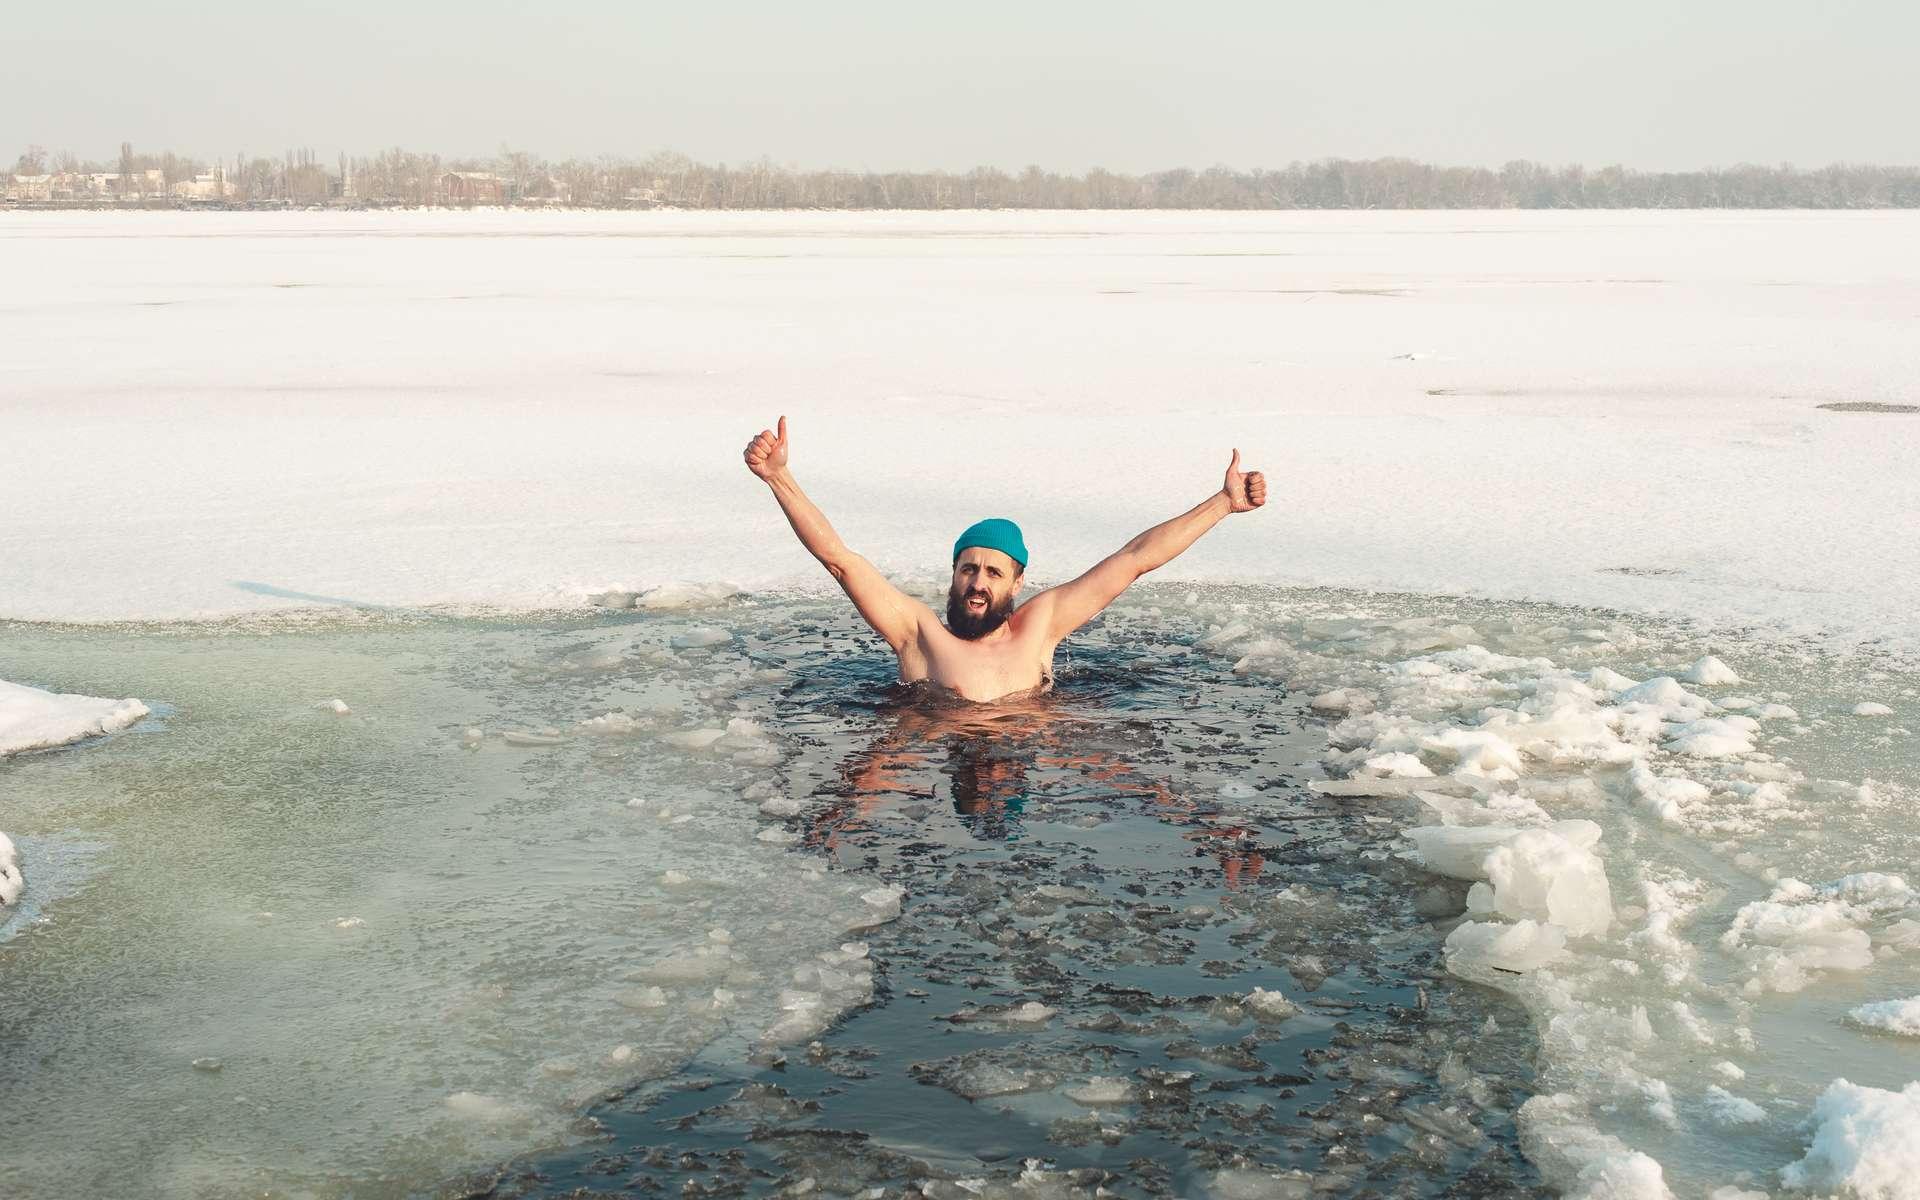 La nage en froide est très pratiquée en Scandinavie. © serguastock, Adobe Stock